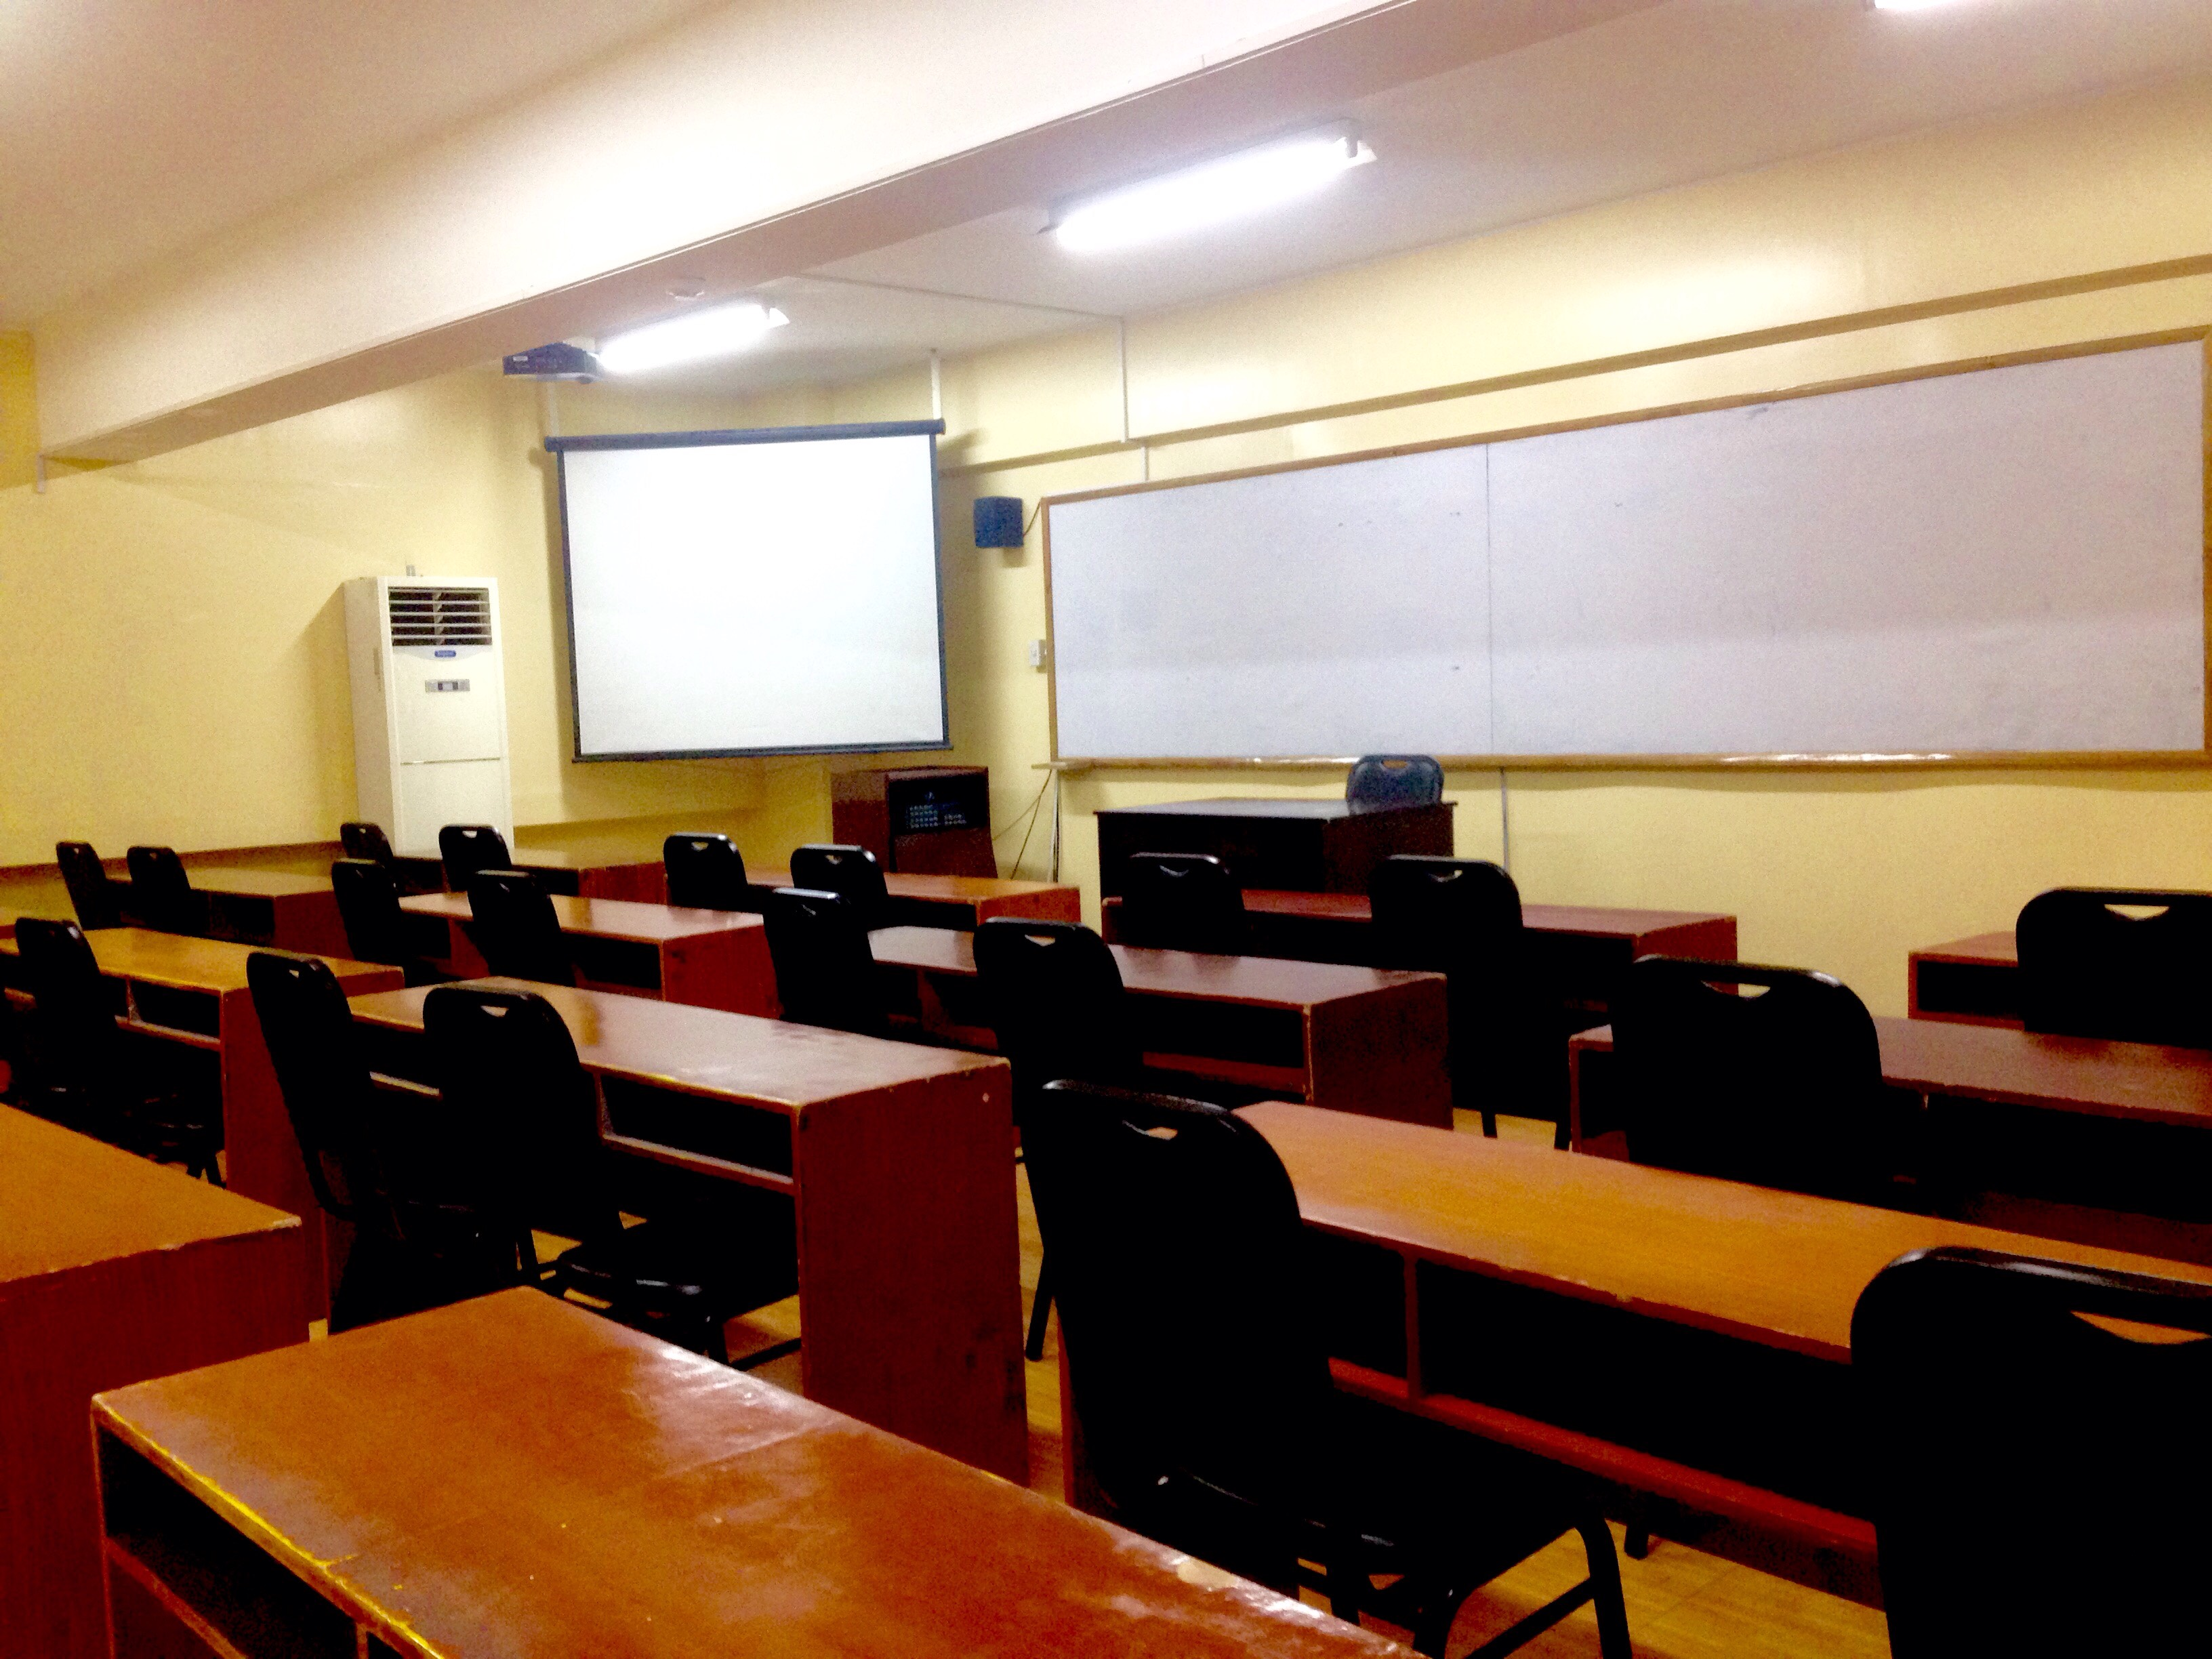 School of Law – Classroom 2